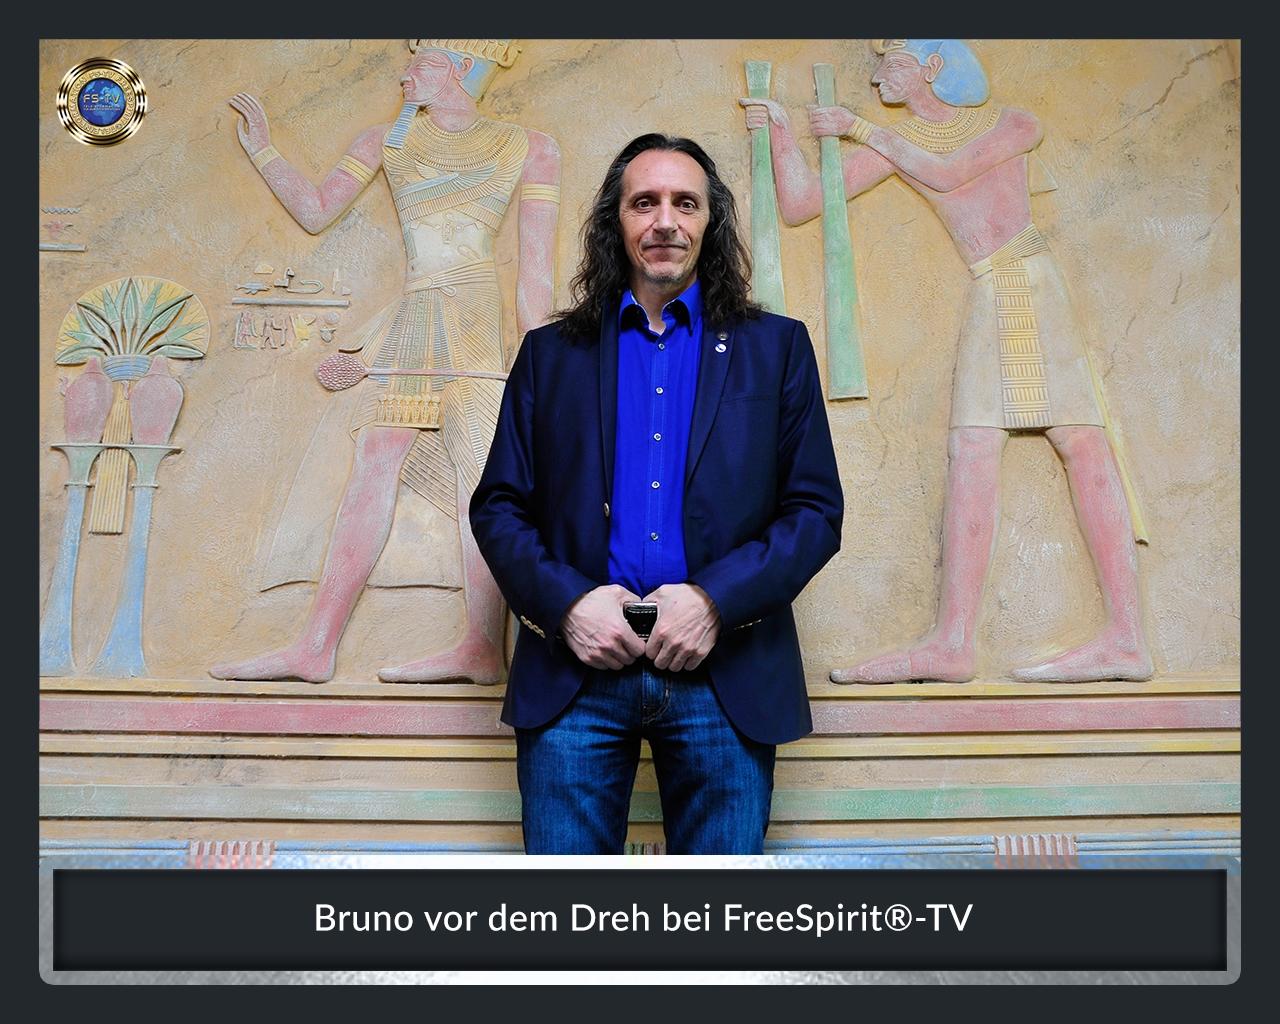 FS-TV-Bildergallerie-Bruno vor Dreh